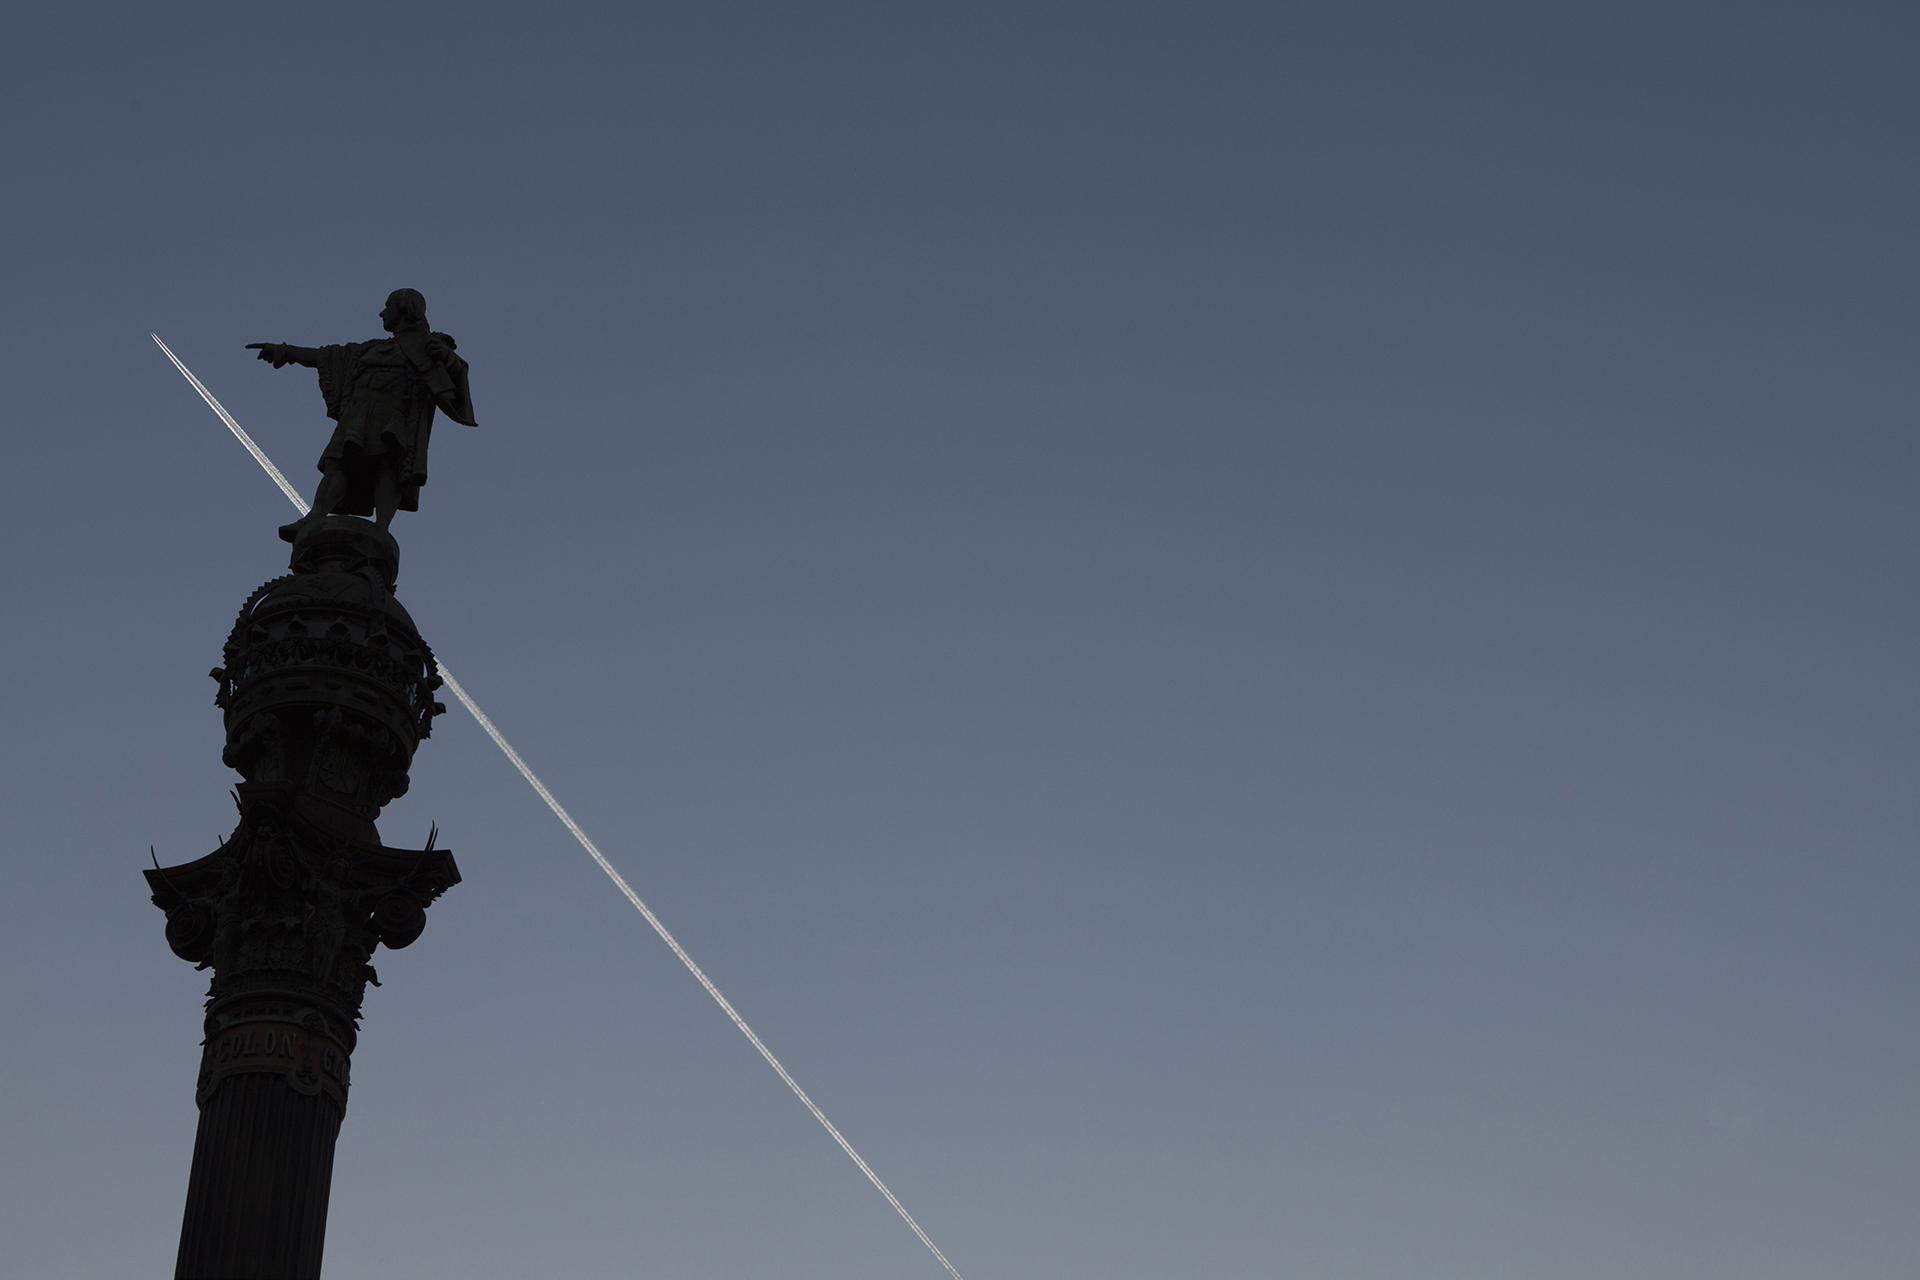 Barcelona_MG_1513.jpg